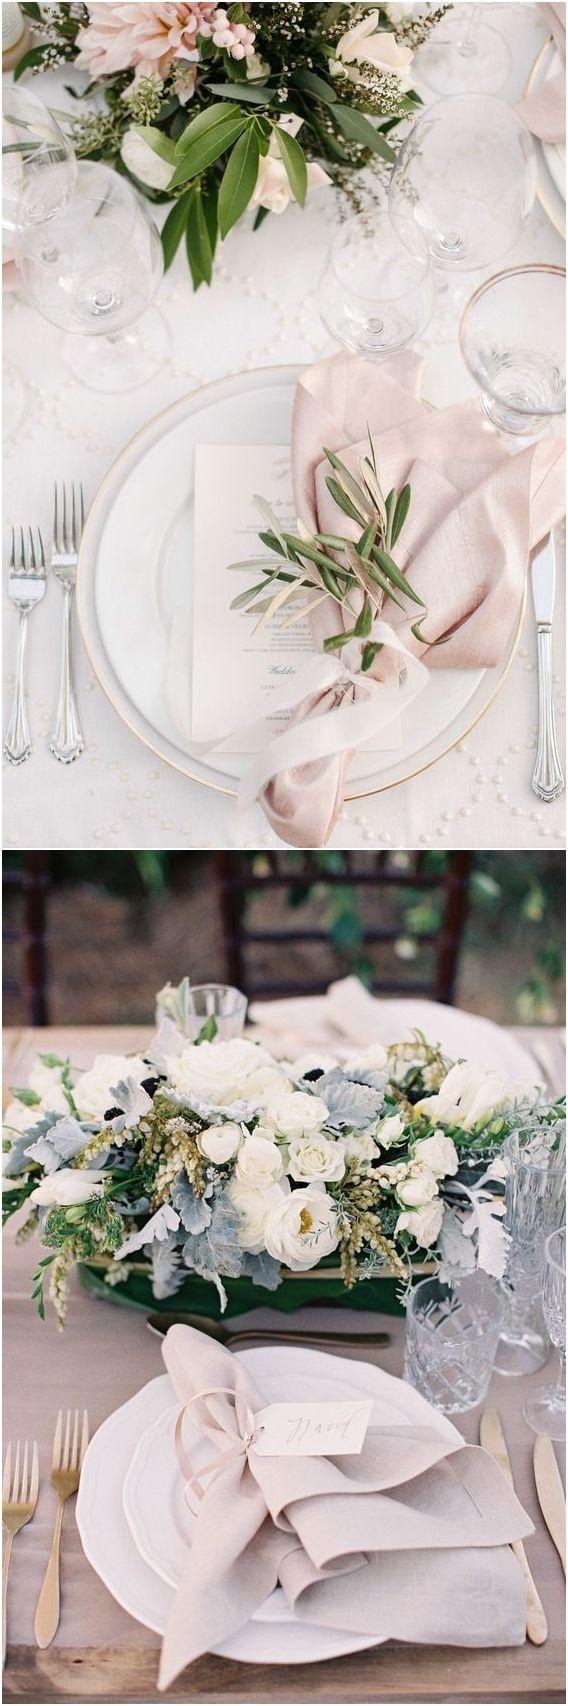 Greenery Wedding Place Setting Ideas / http://www.deerpearlflowers.com/greenery-wedding-place-setting-ideas/